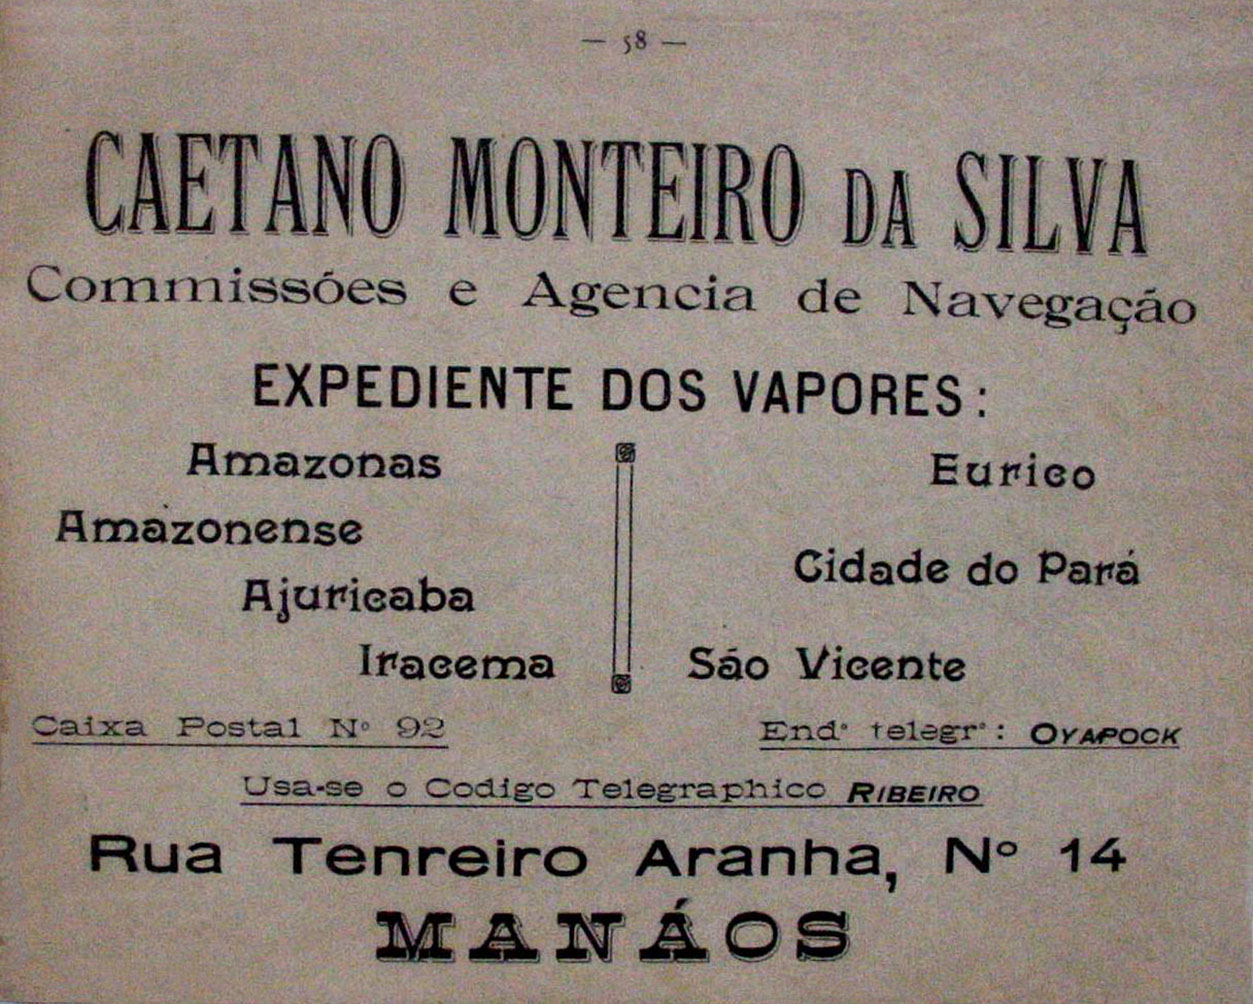 Propaganda da Empresa Caetano Monteiro da Silva